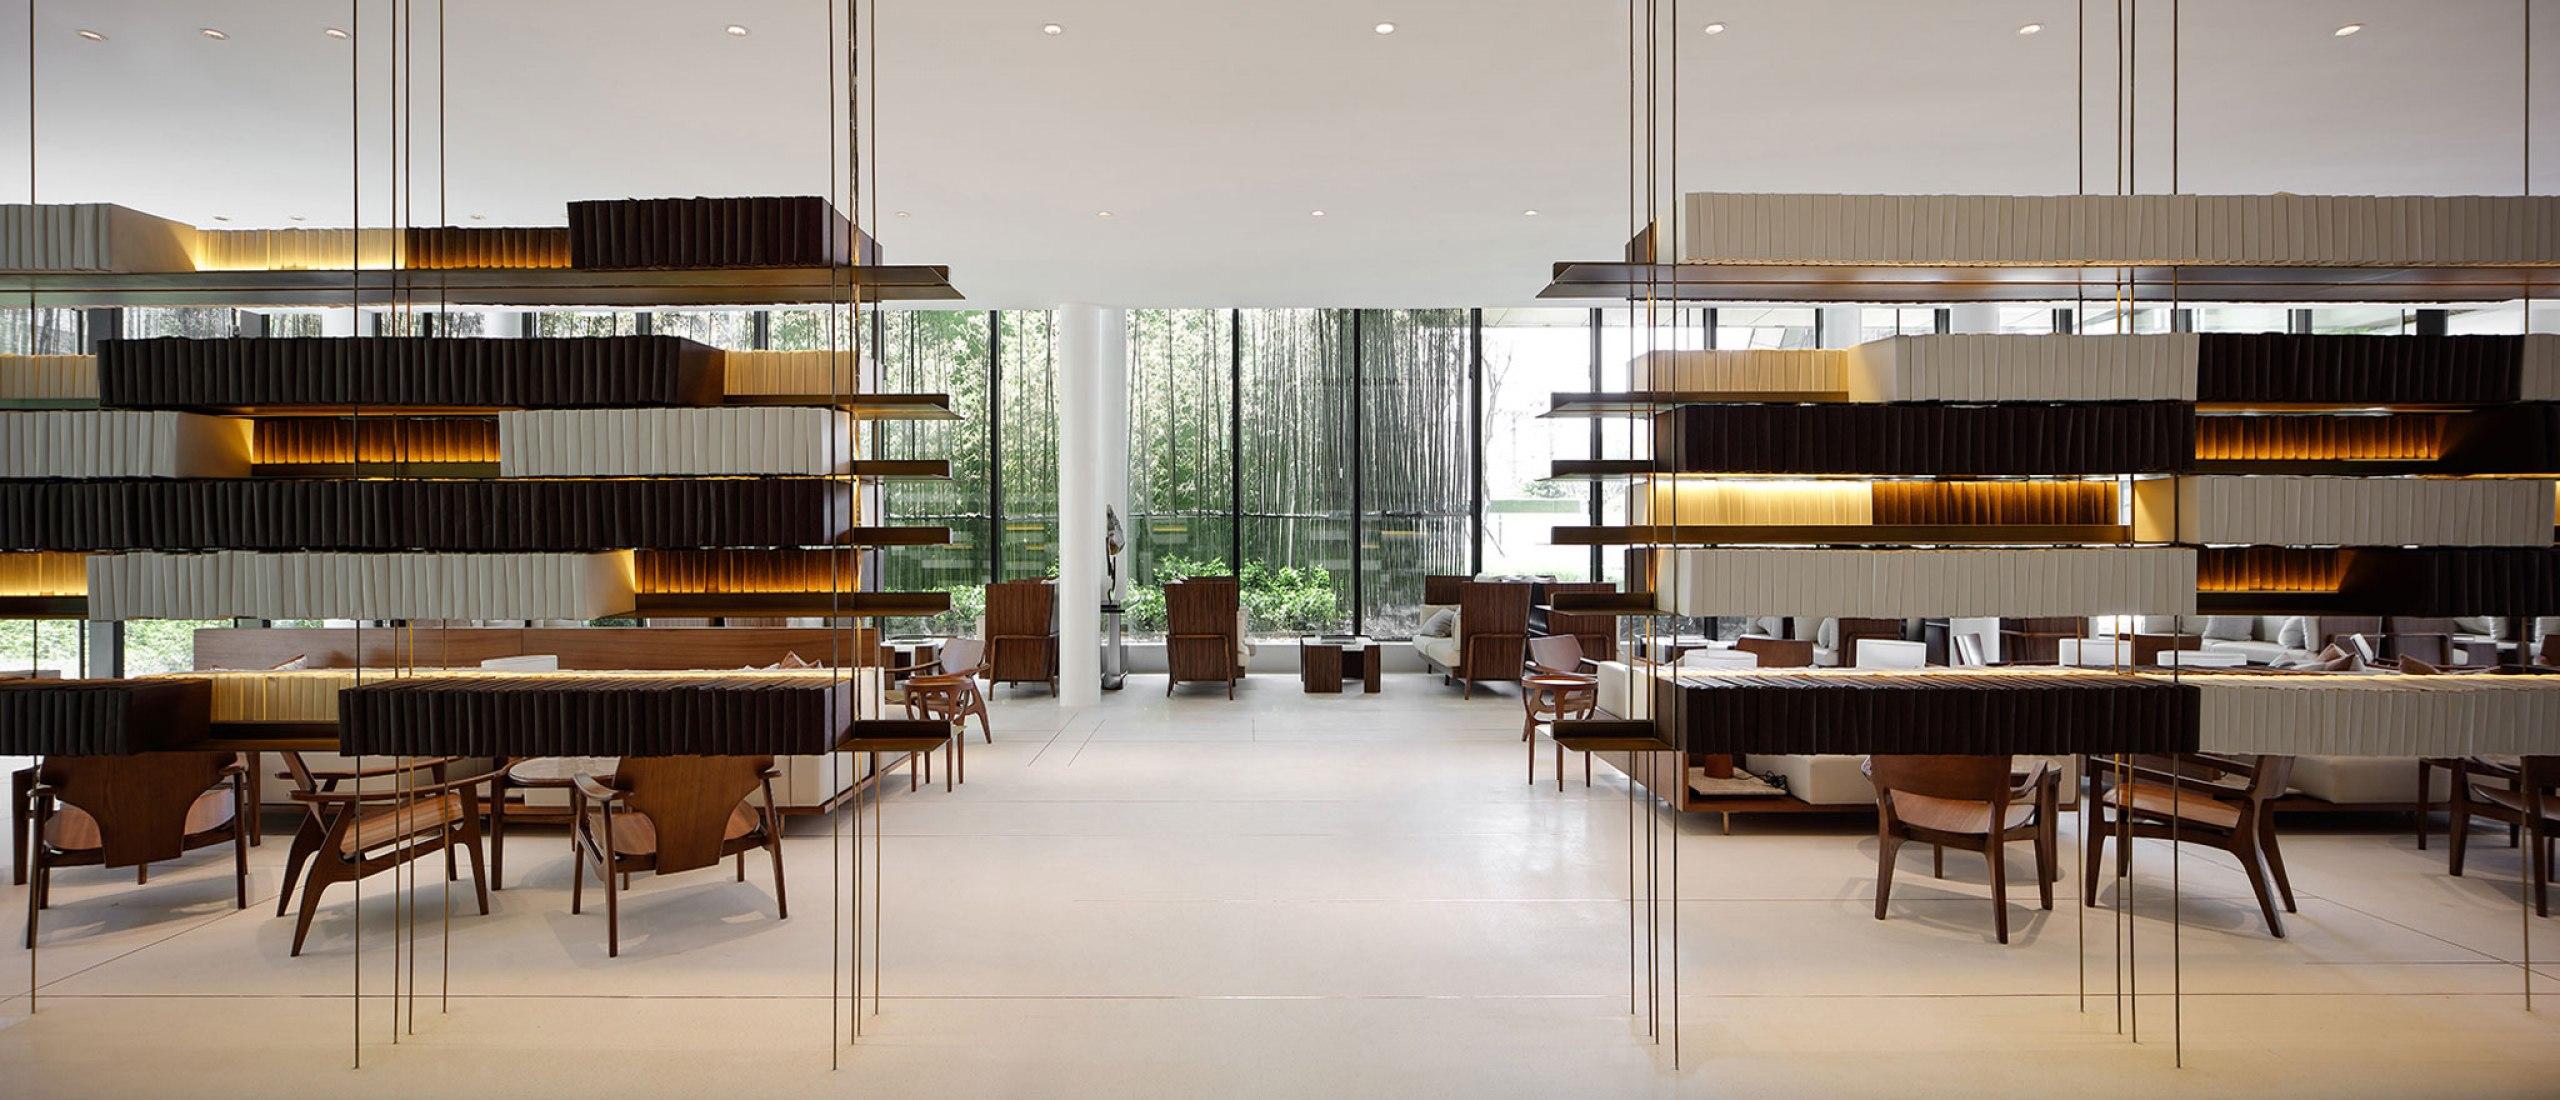 Sala de reunión. SINO-OCEAN. Oriental Worldview Sales Center. Fotografía por Yuchen Chao. Copyright por Waterfrom Design